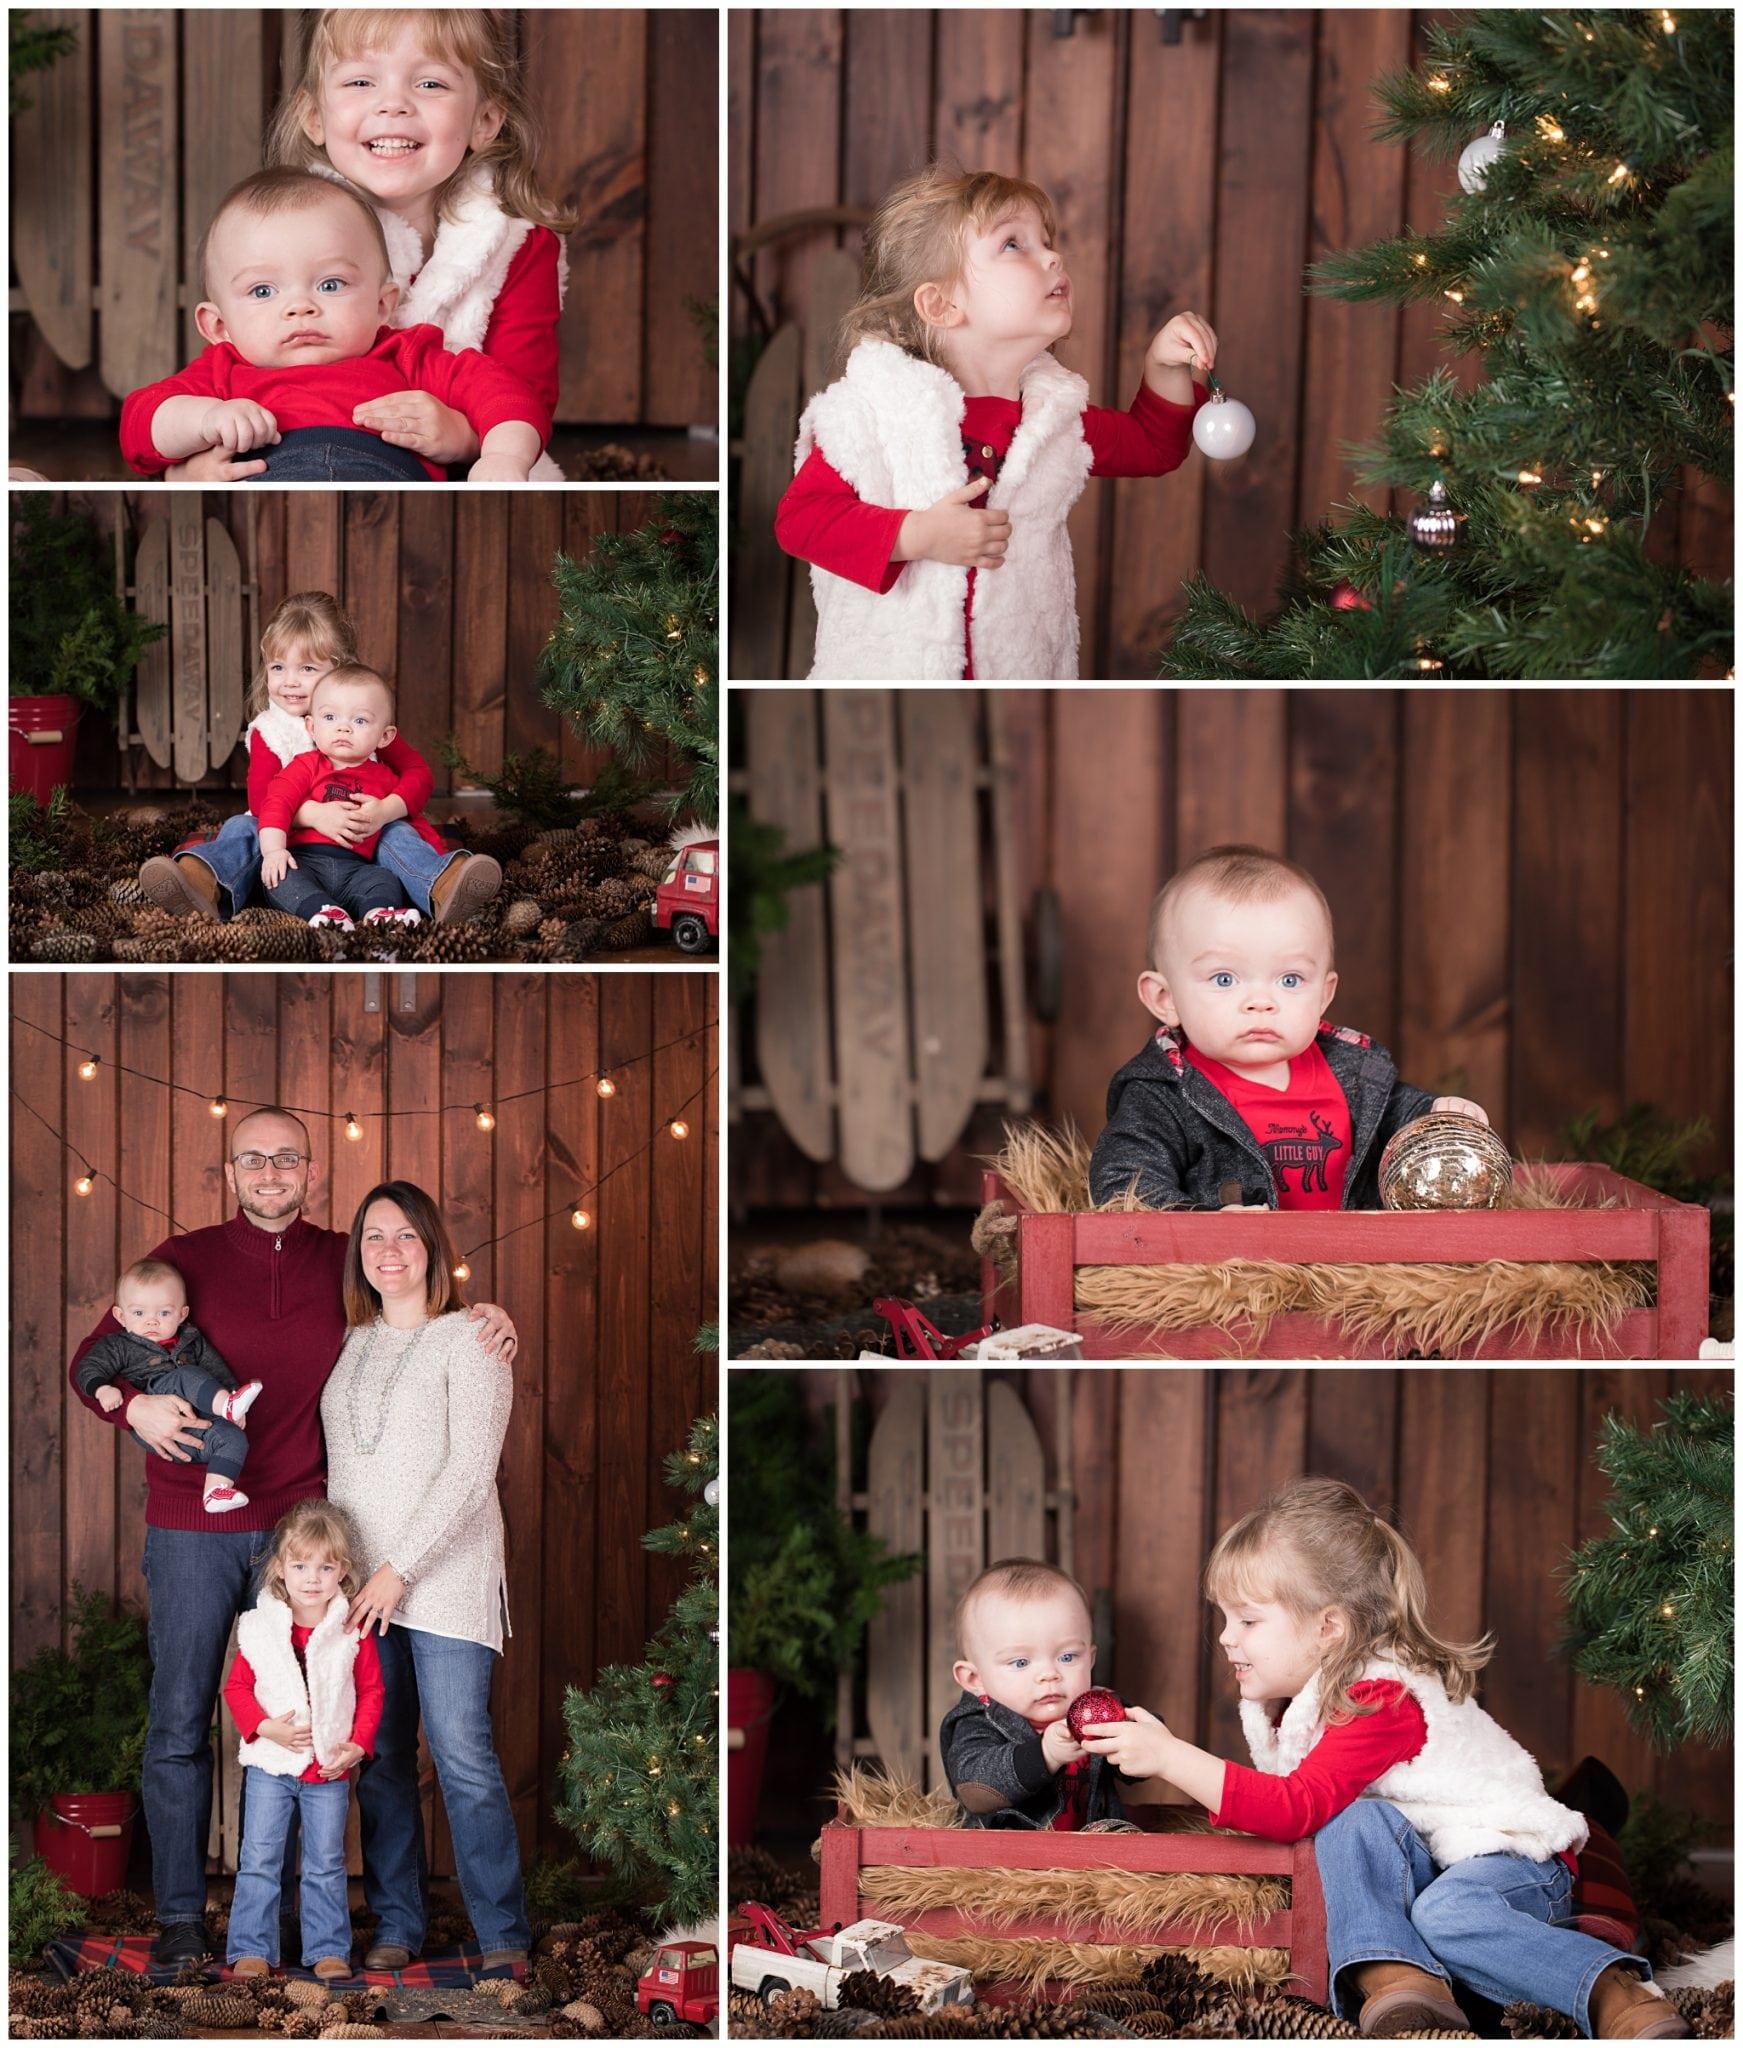 ChristmasMiniSessions_family-baby-kids_Berks-County-Reading-PA_0031.jpg